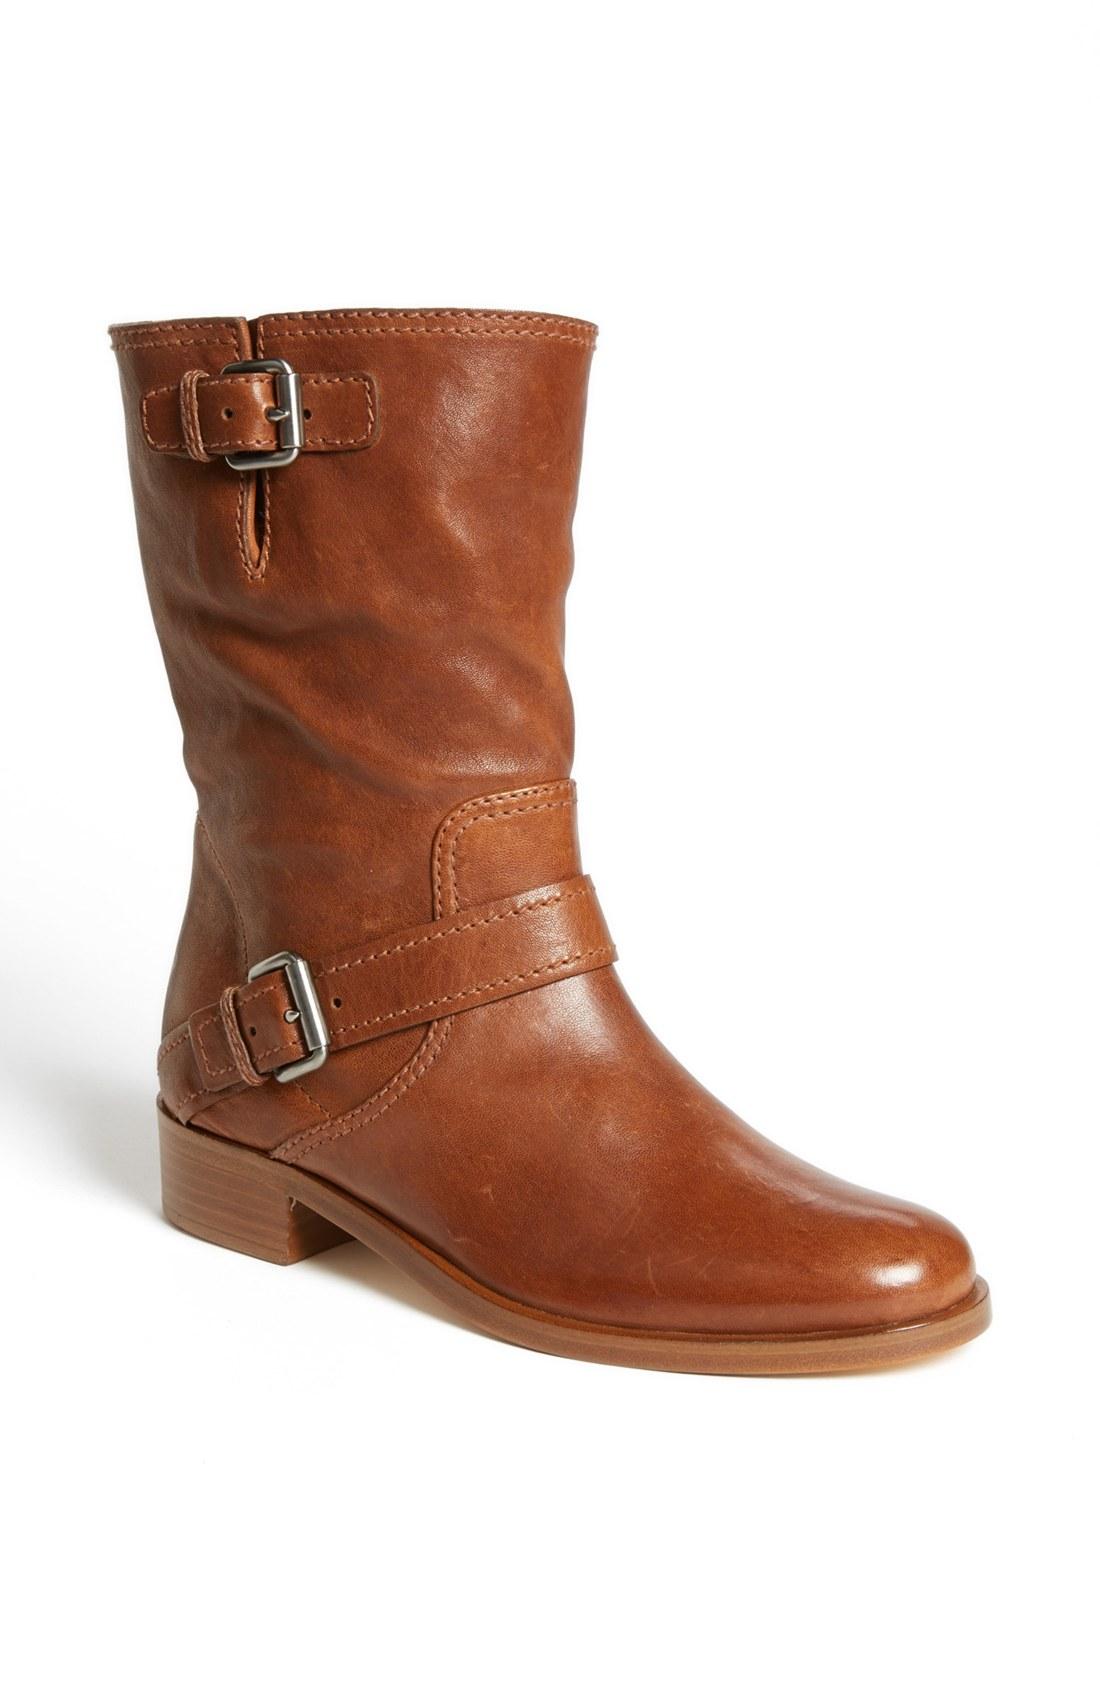 miu miu buckle boot in brown lyst